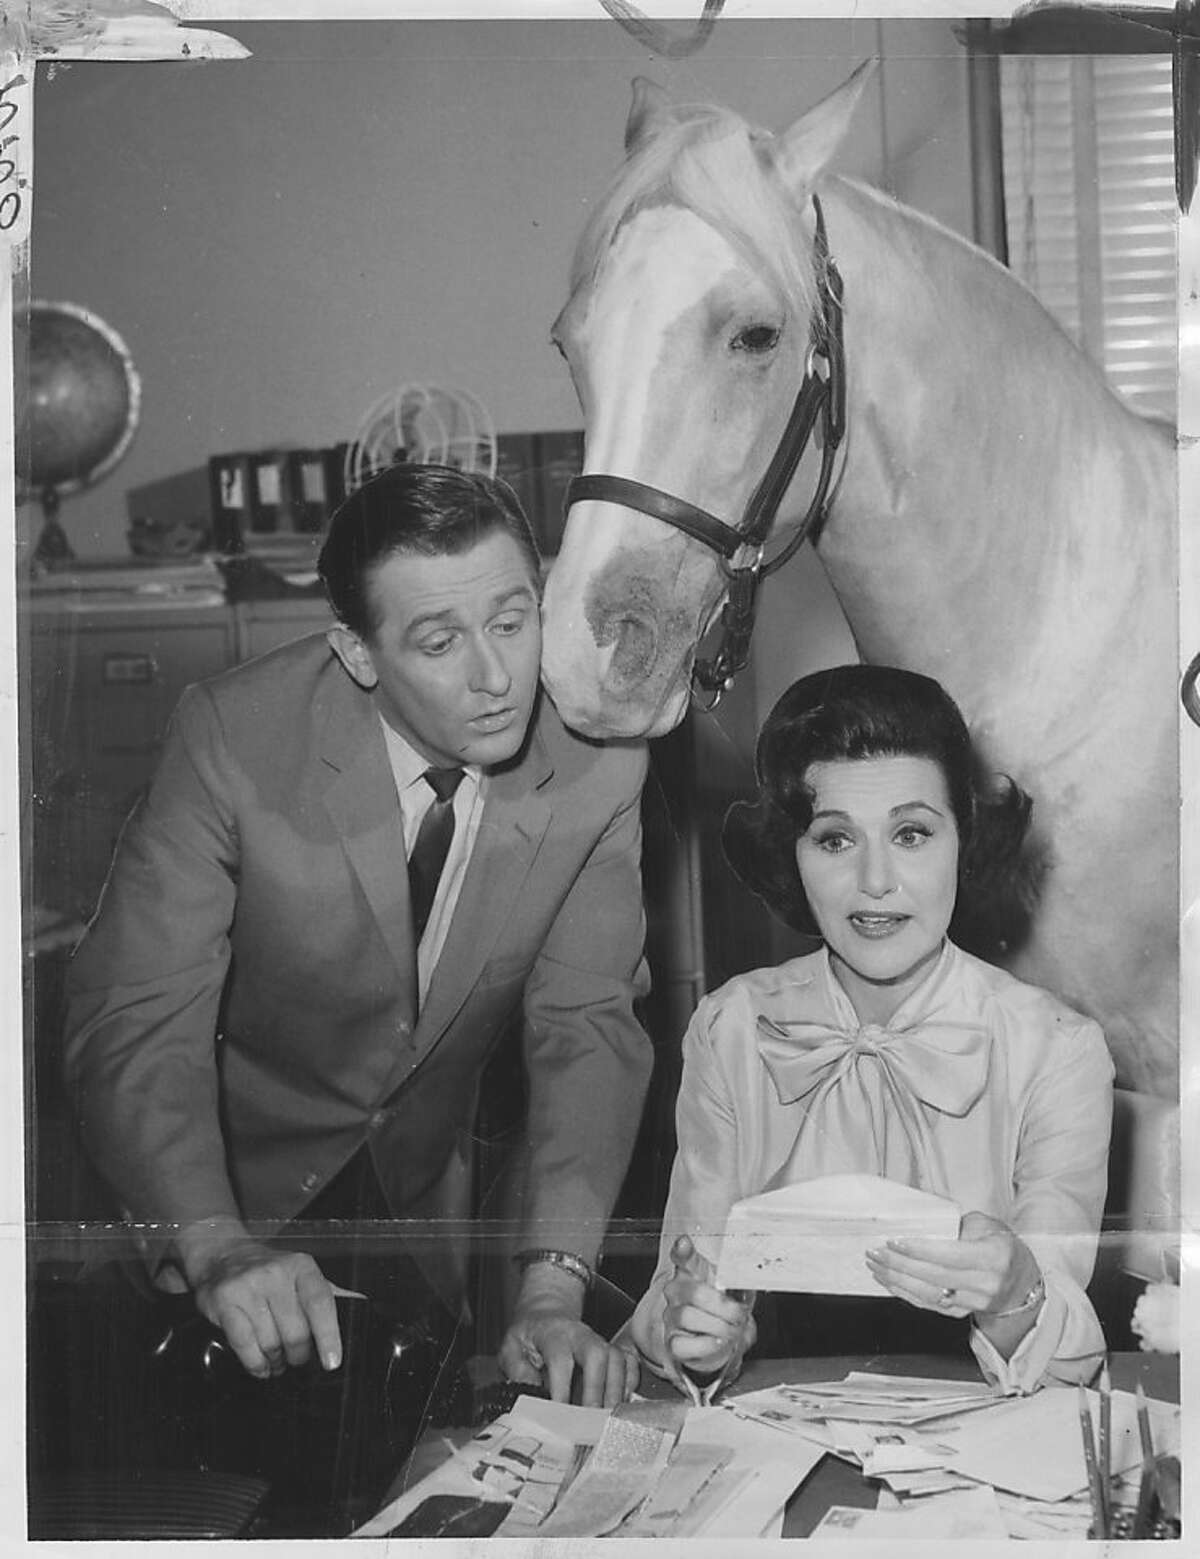 Abby did a guest appearance on television show, Mr. Ed Pauline Phillips .. aka Abigail Van Buren aka Dear Abby TV still. Photo was taken: 10/16/1964.